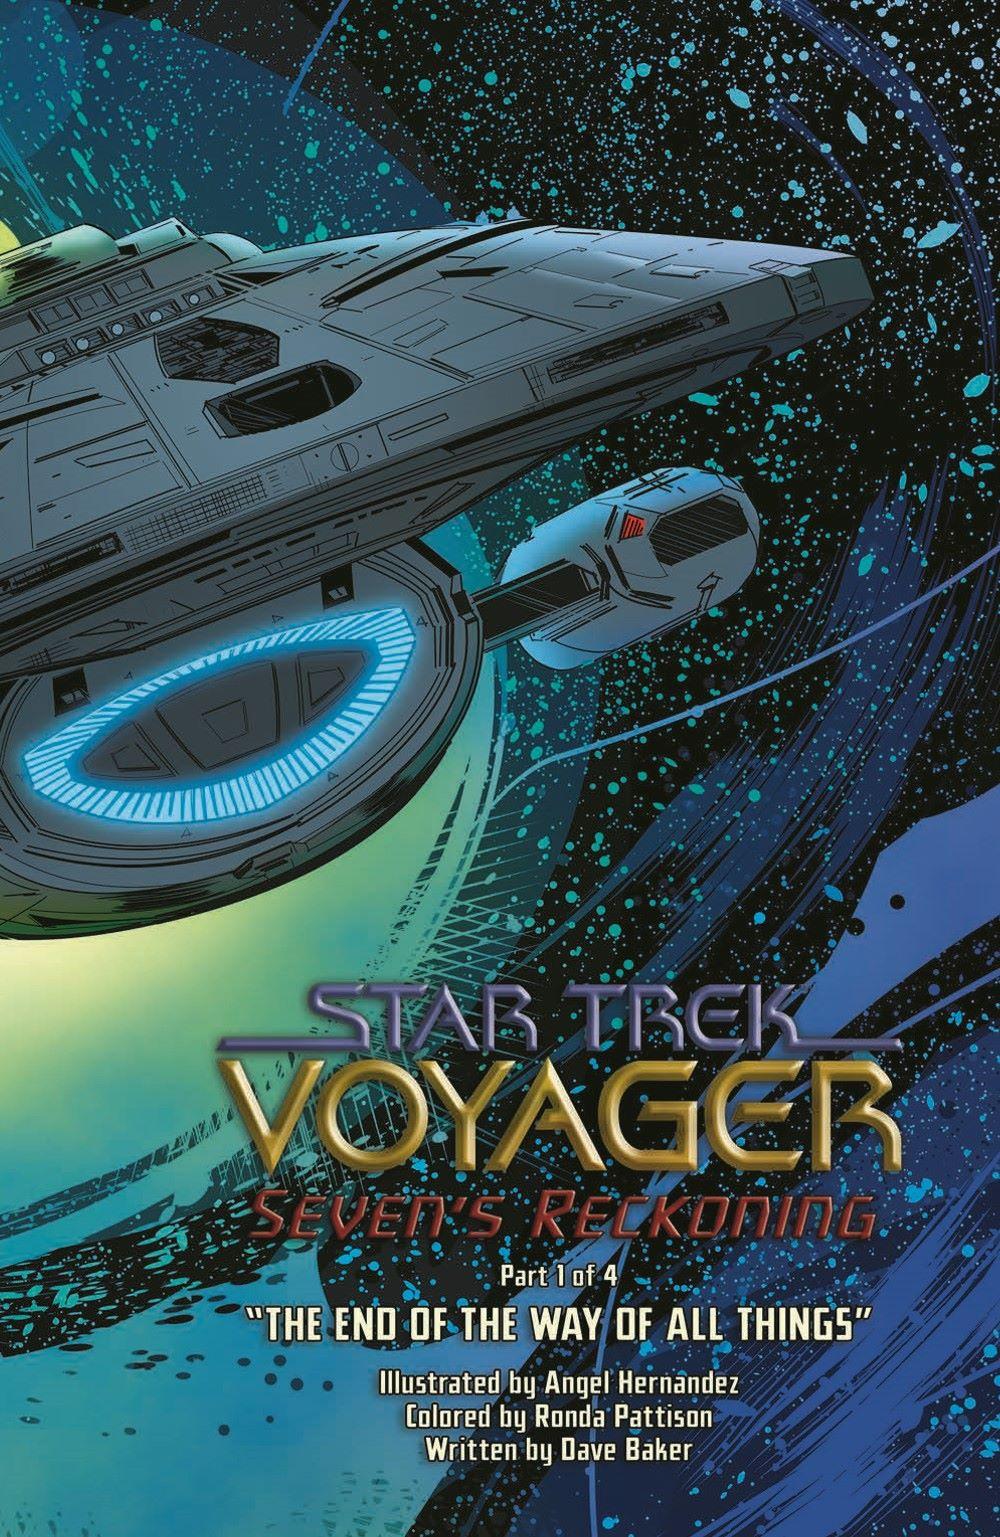 ST_Voyager_SR01-pr-5 ComicList Previews: STAR TREK VOYAGER SEVEN'S RECKONING #1 (OF 4)